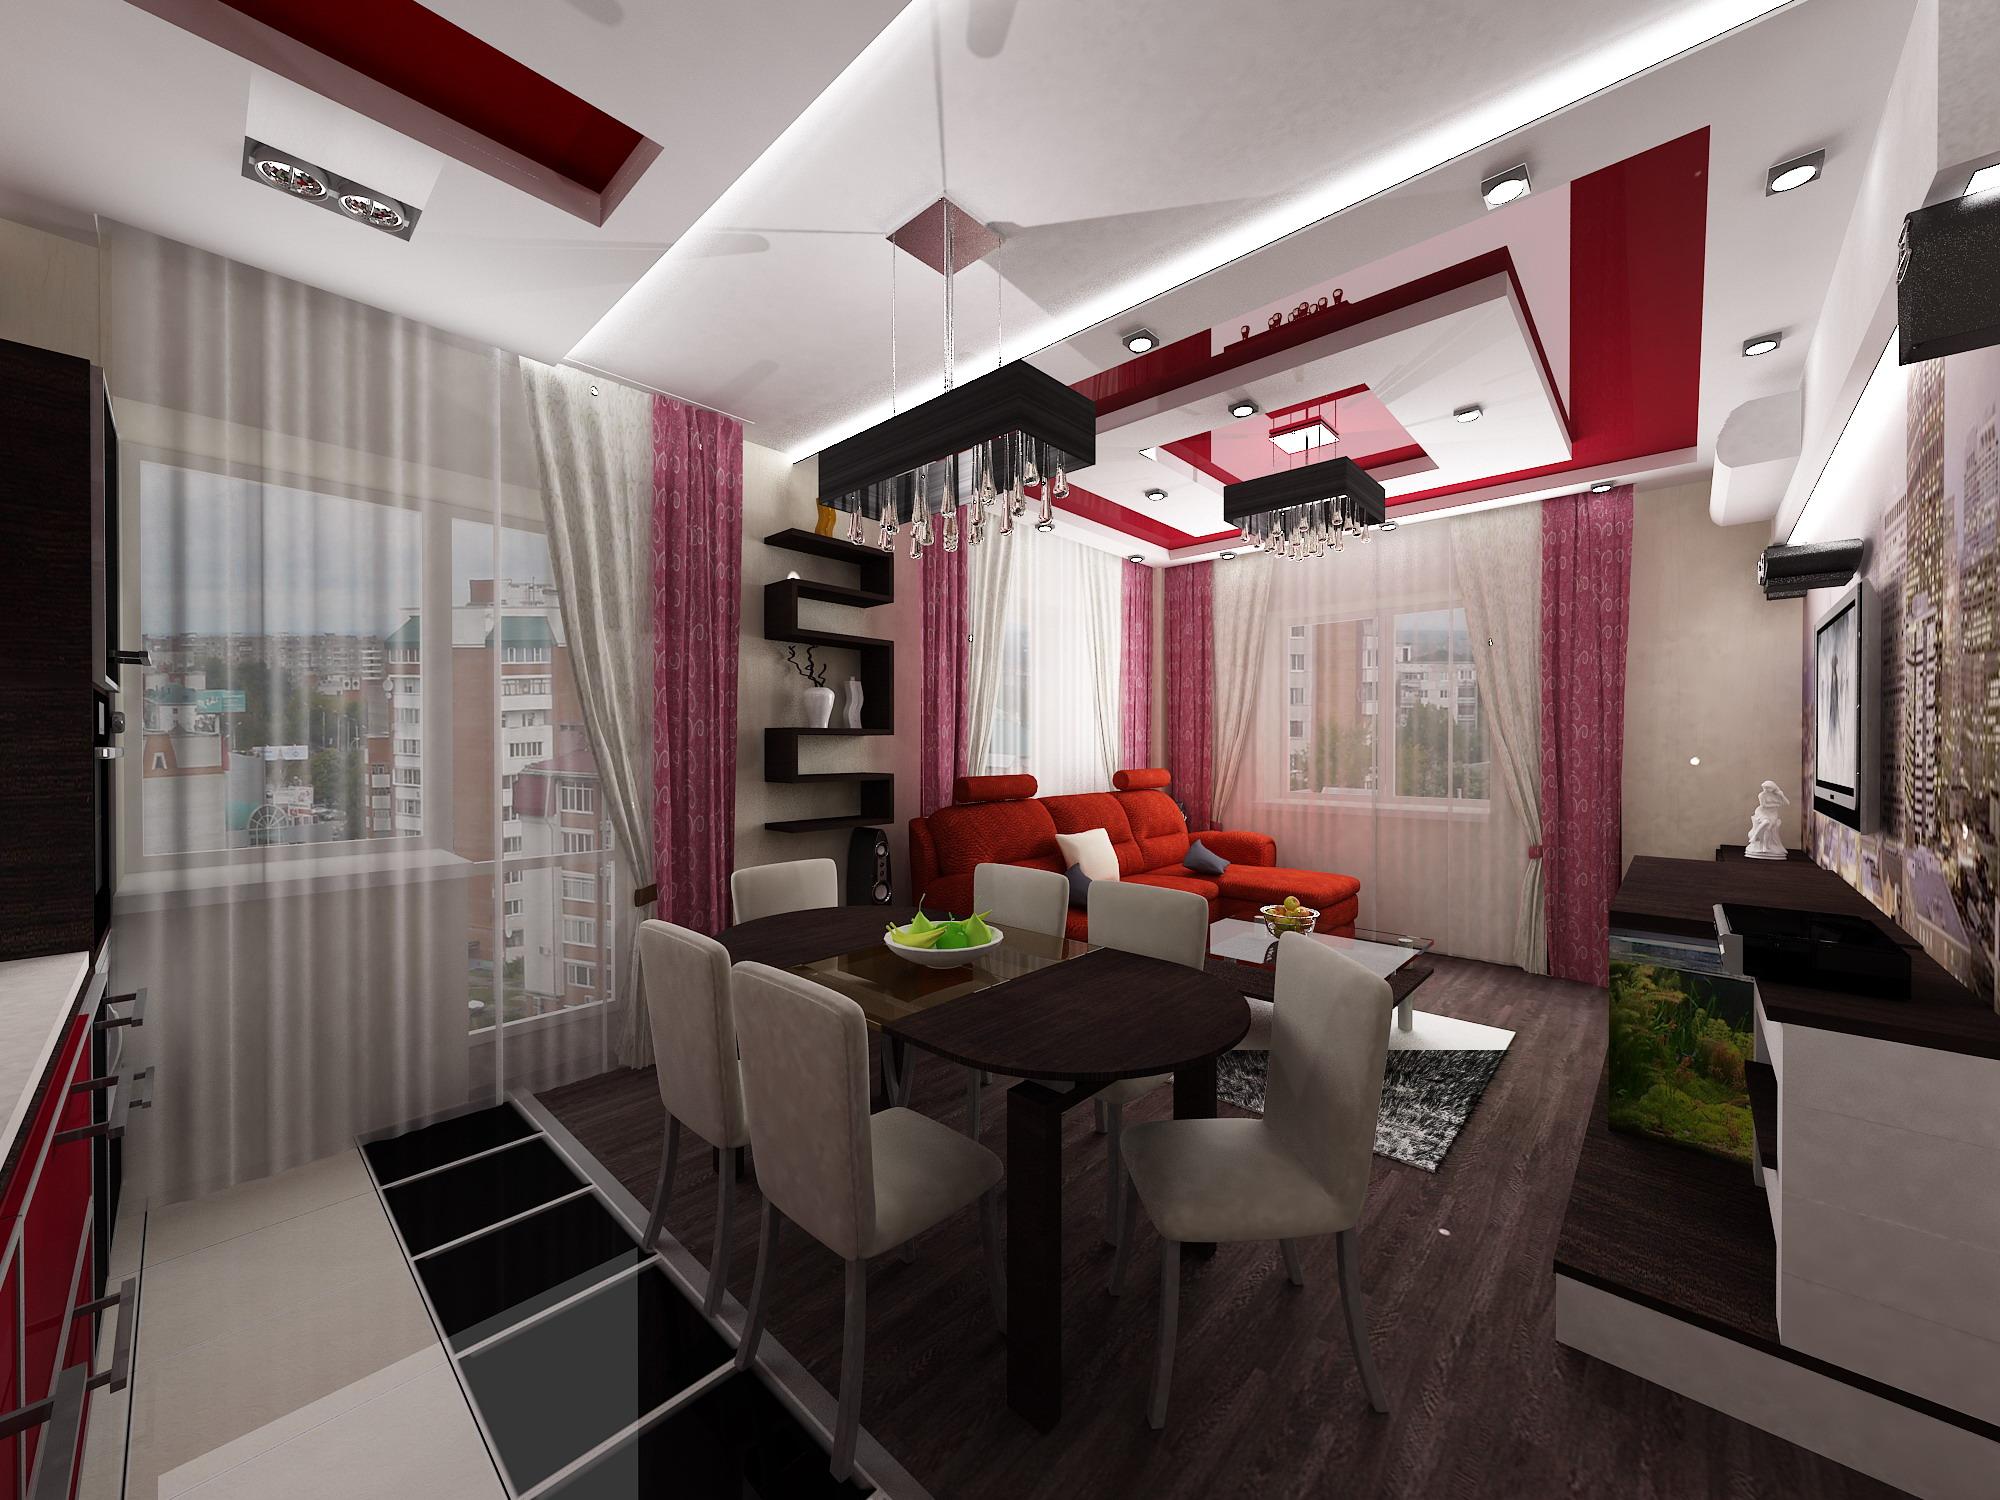 Дизайн 3 комнатной квартиры фото 80 кв